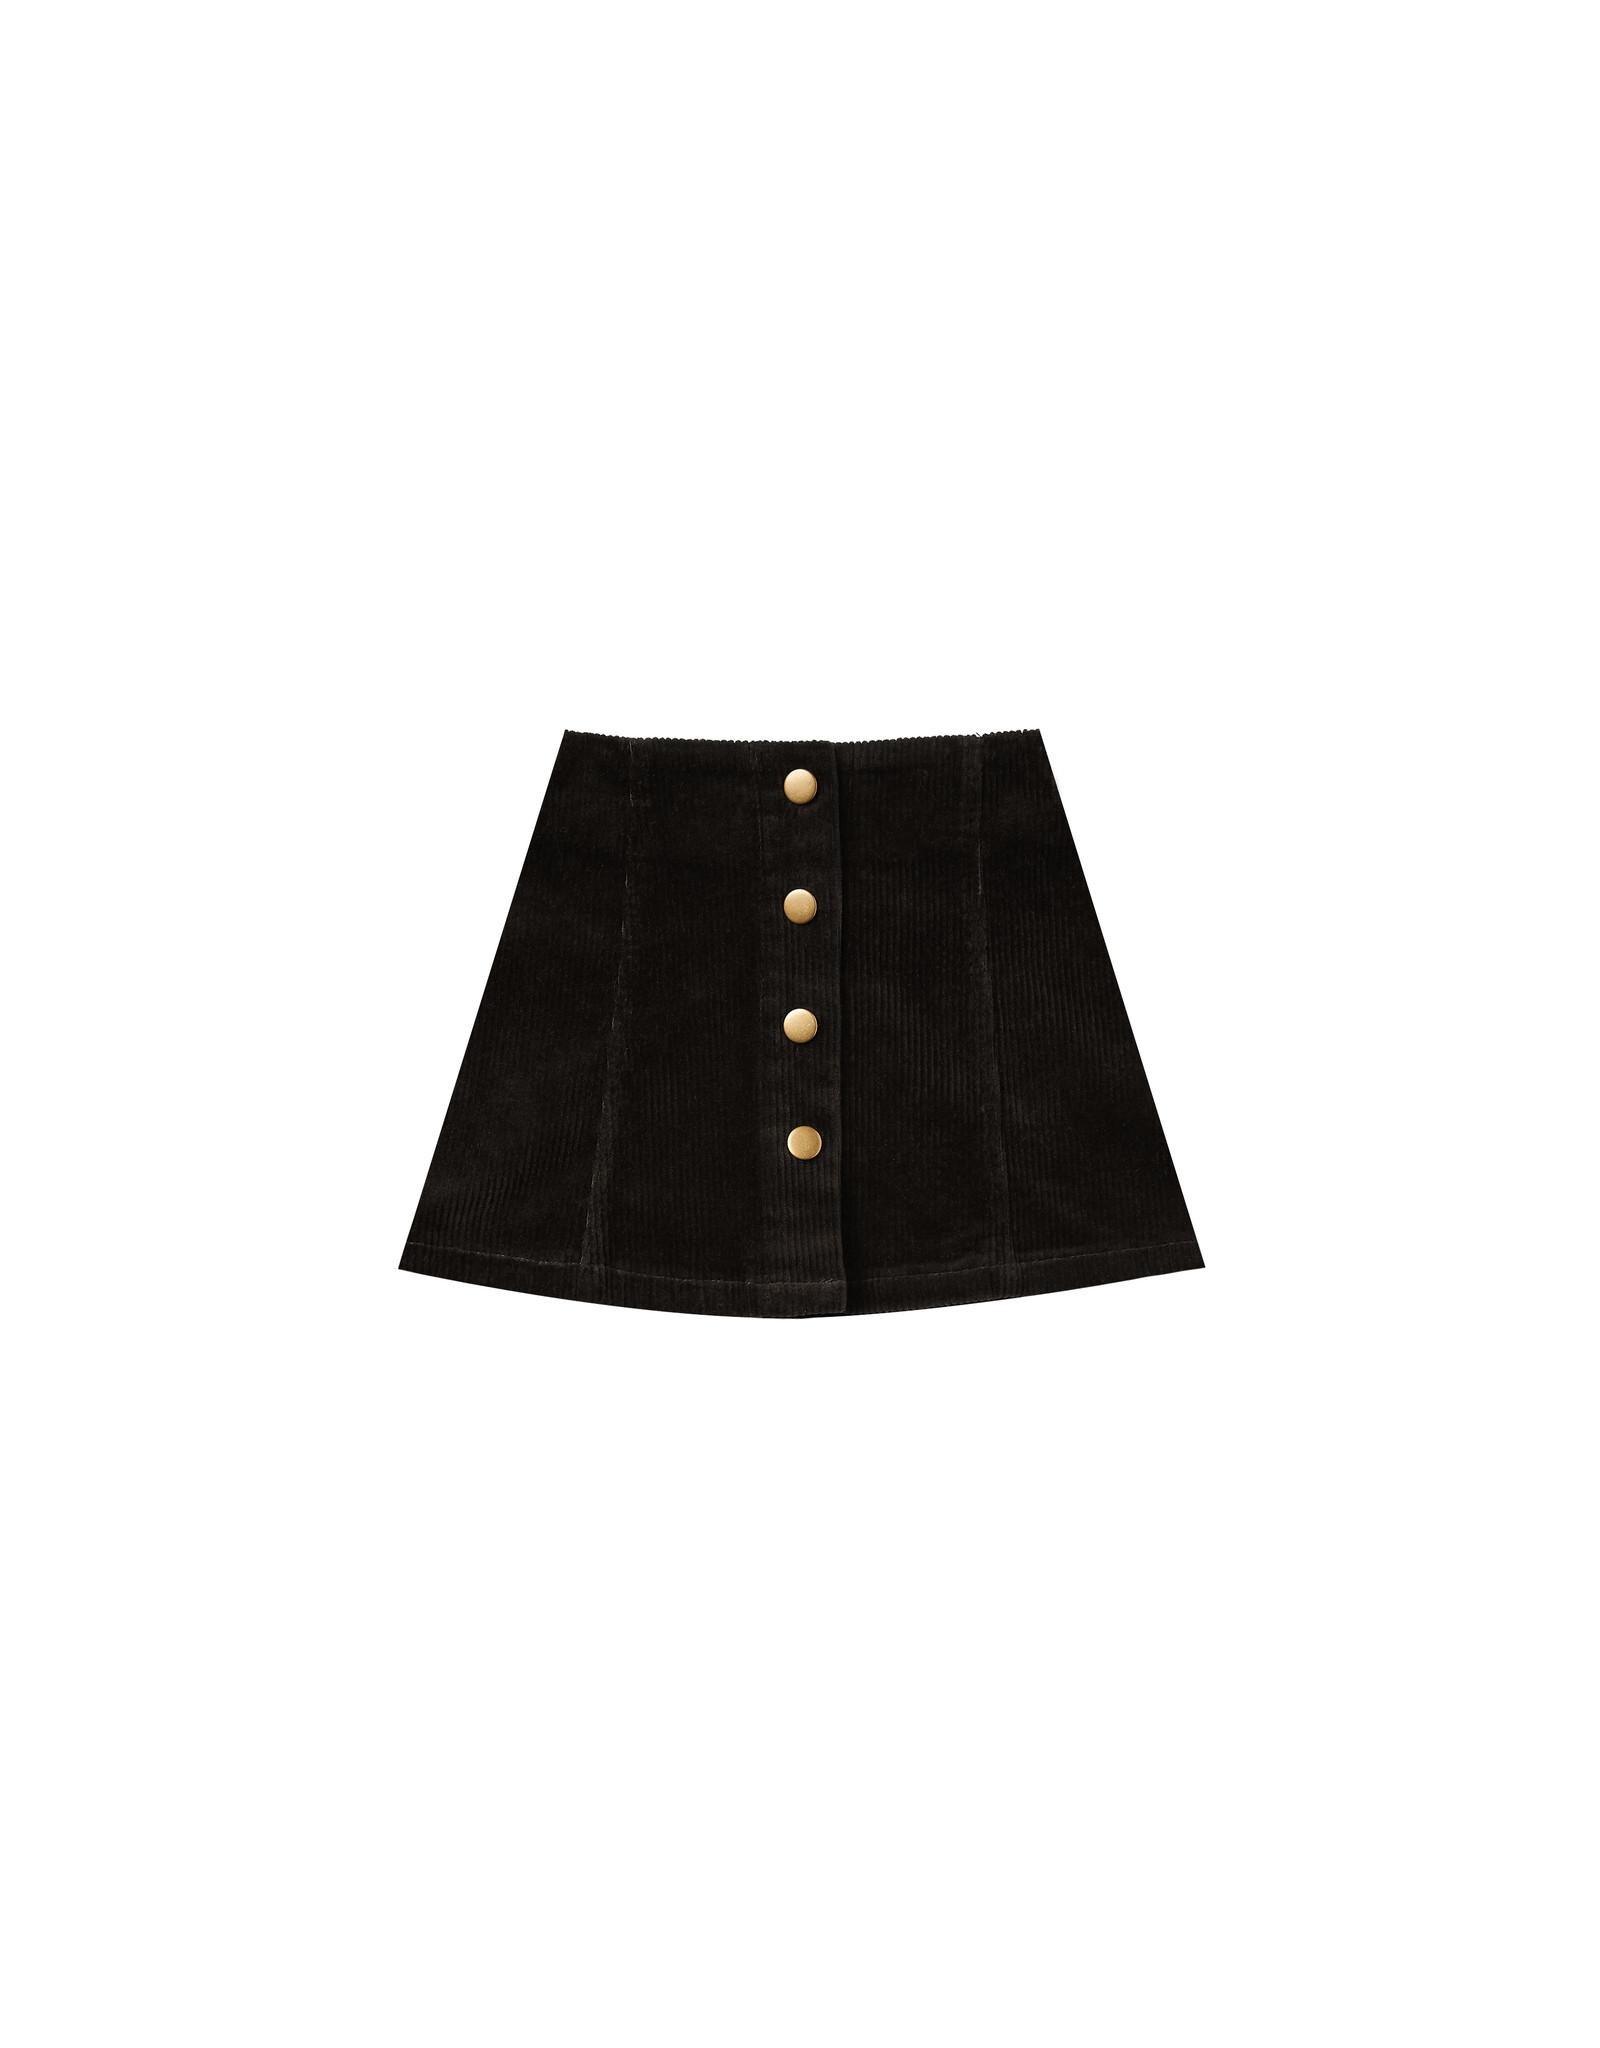 Rylee + Cru Corduroy Mini Skirt